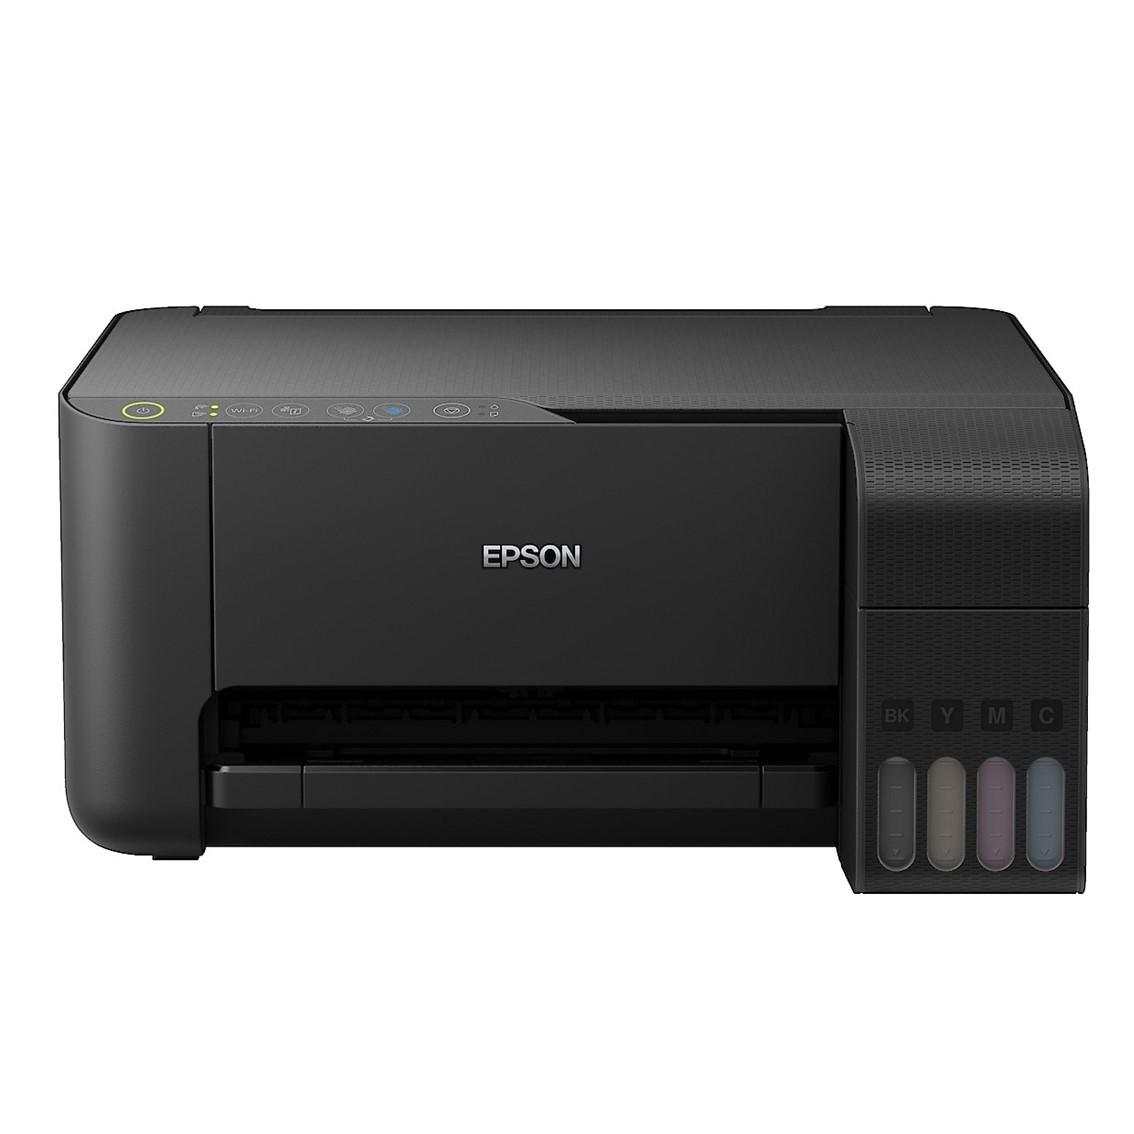 Multifuncion Epson Inyeccion Color Ecotank Et-2715 A4/ 33ppm/ Usb/ Wifi/ Wifi Direct 0.0